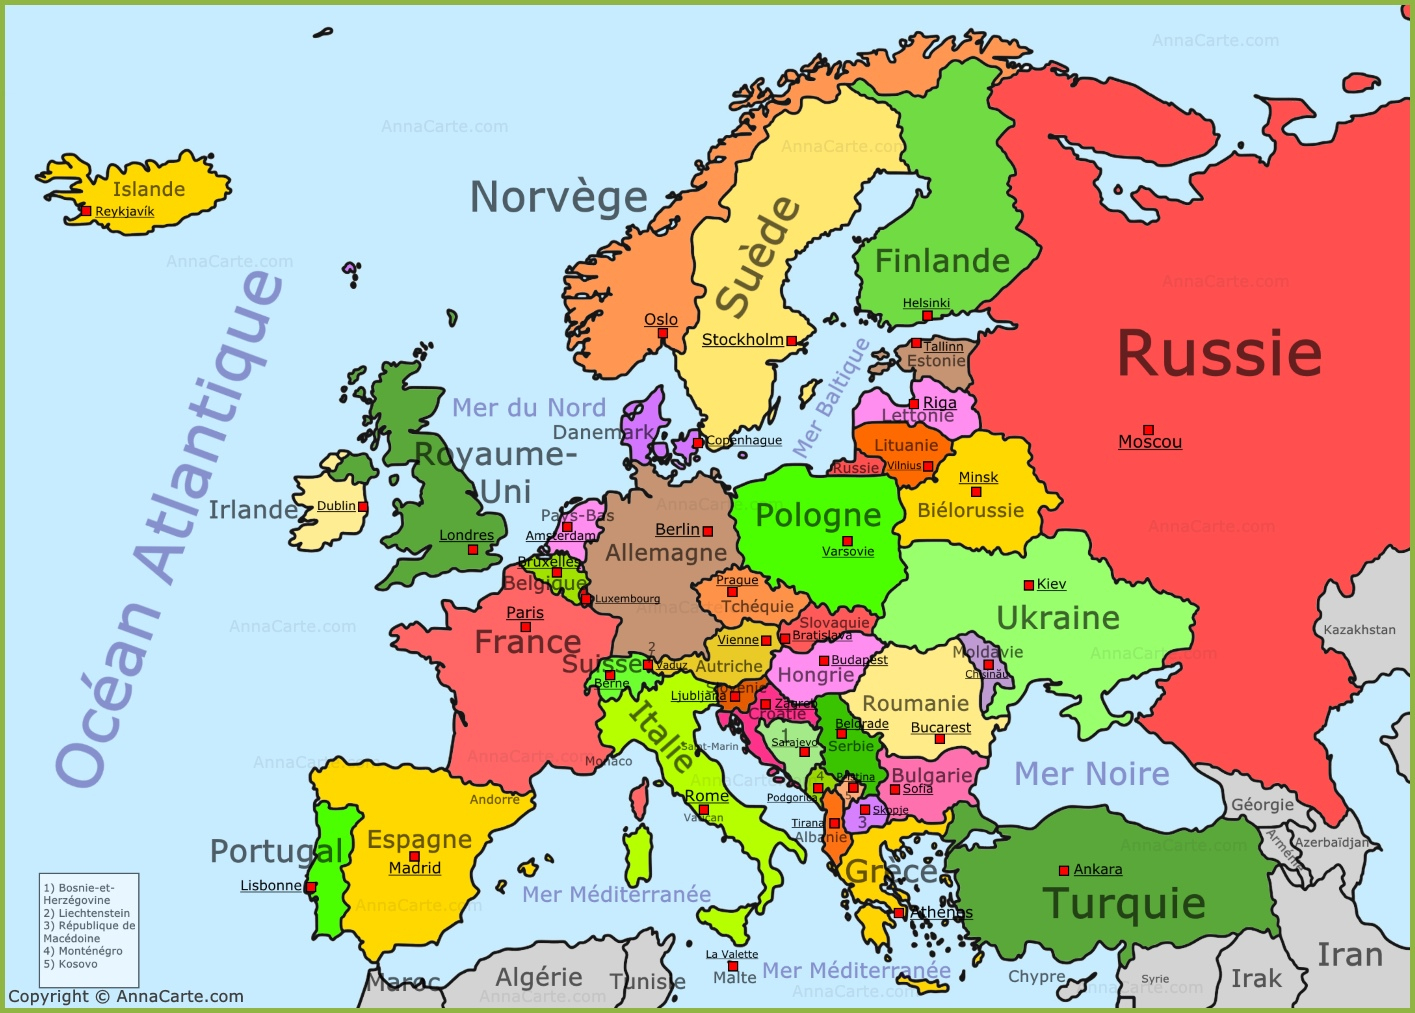 Cartograf.fr : Carte Europe : Page 8 pour Carte Europe Pays Capitales